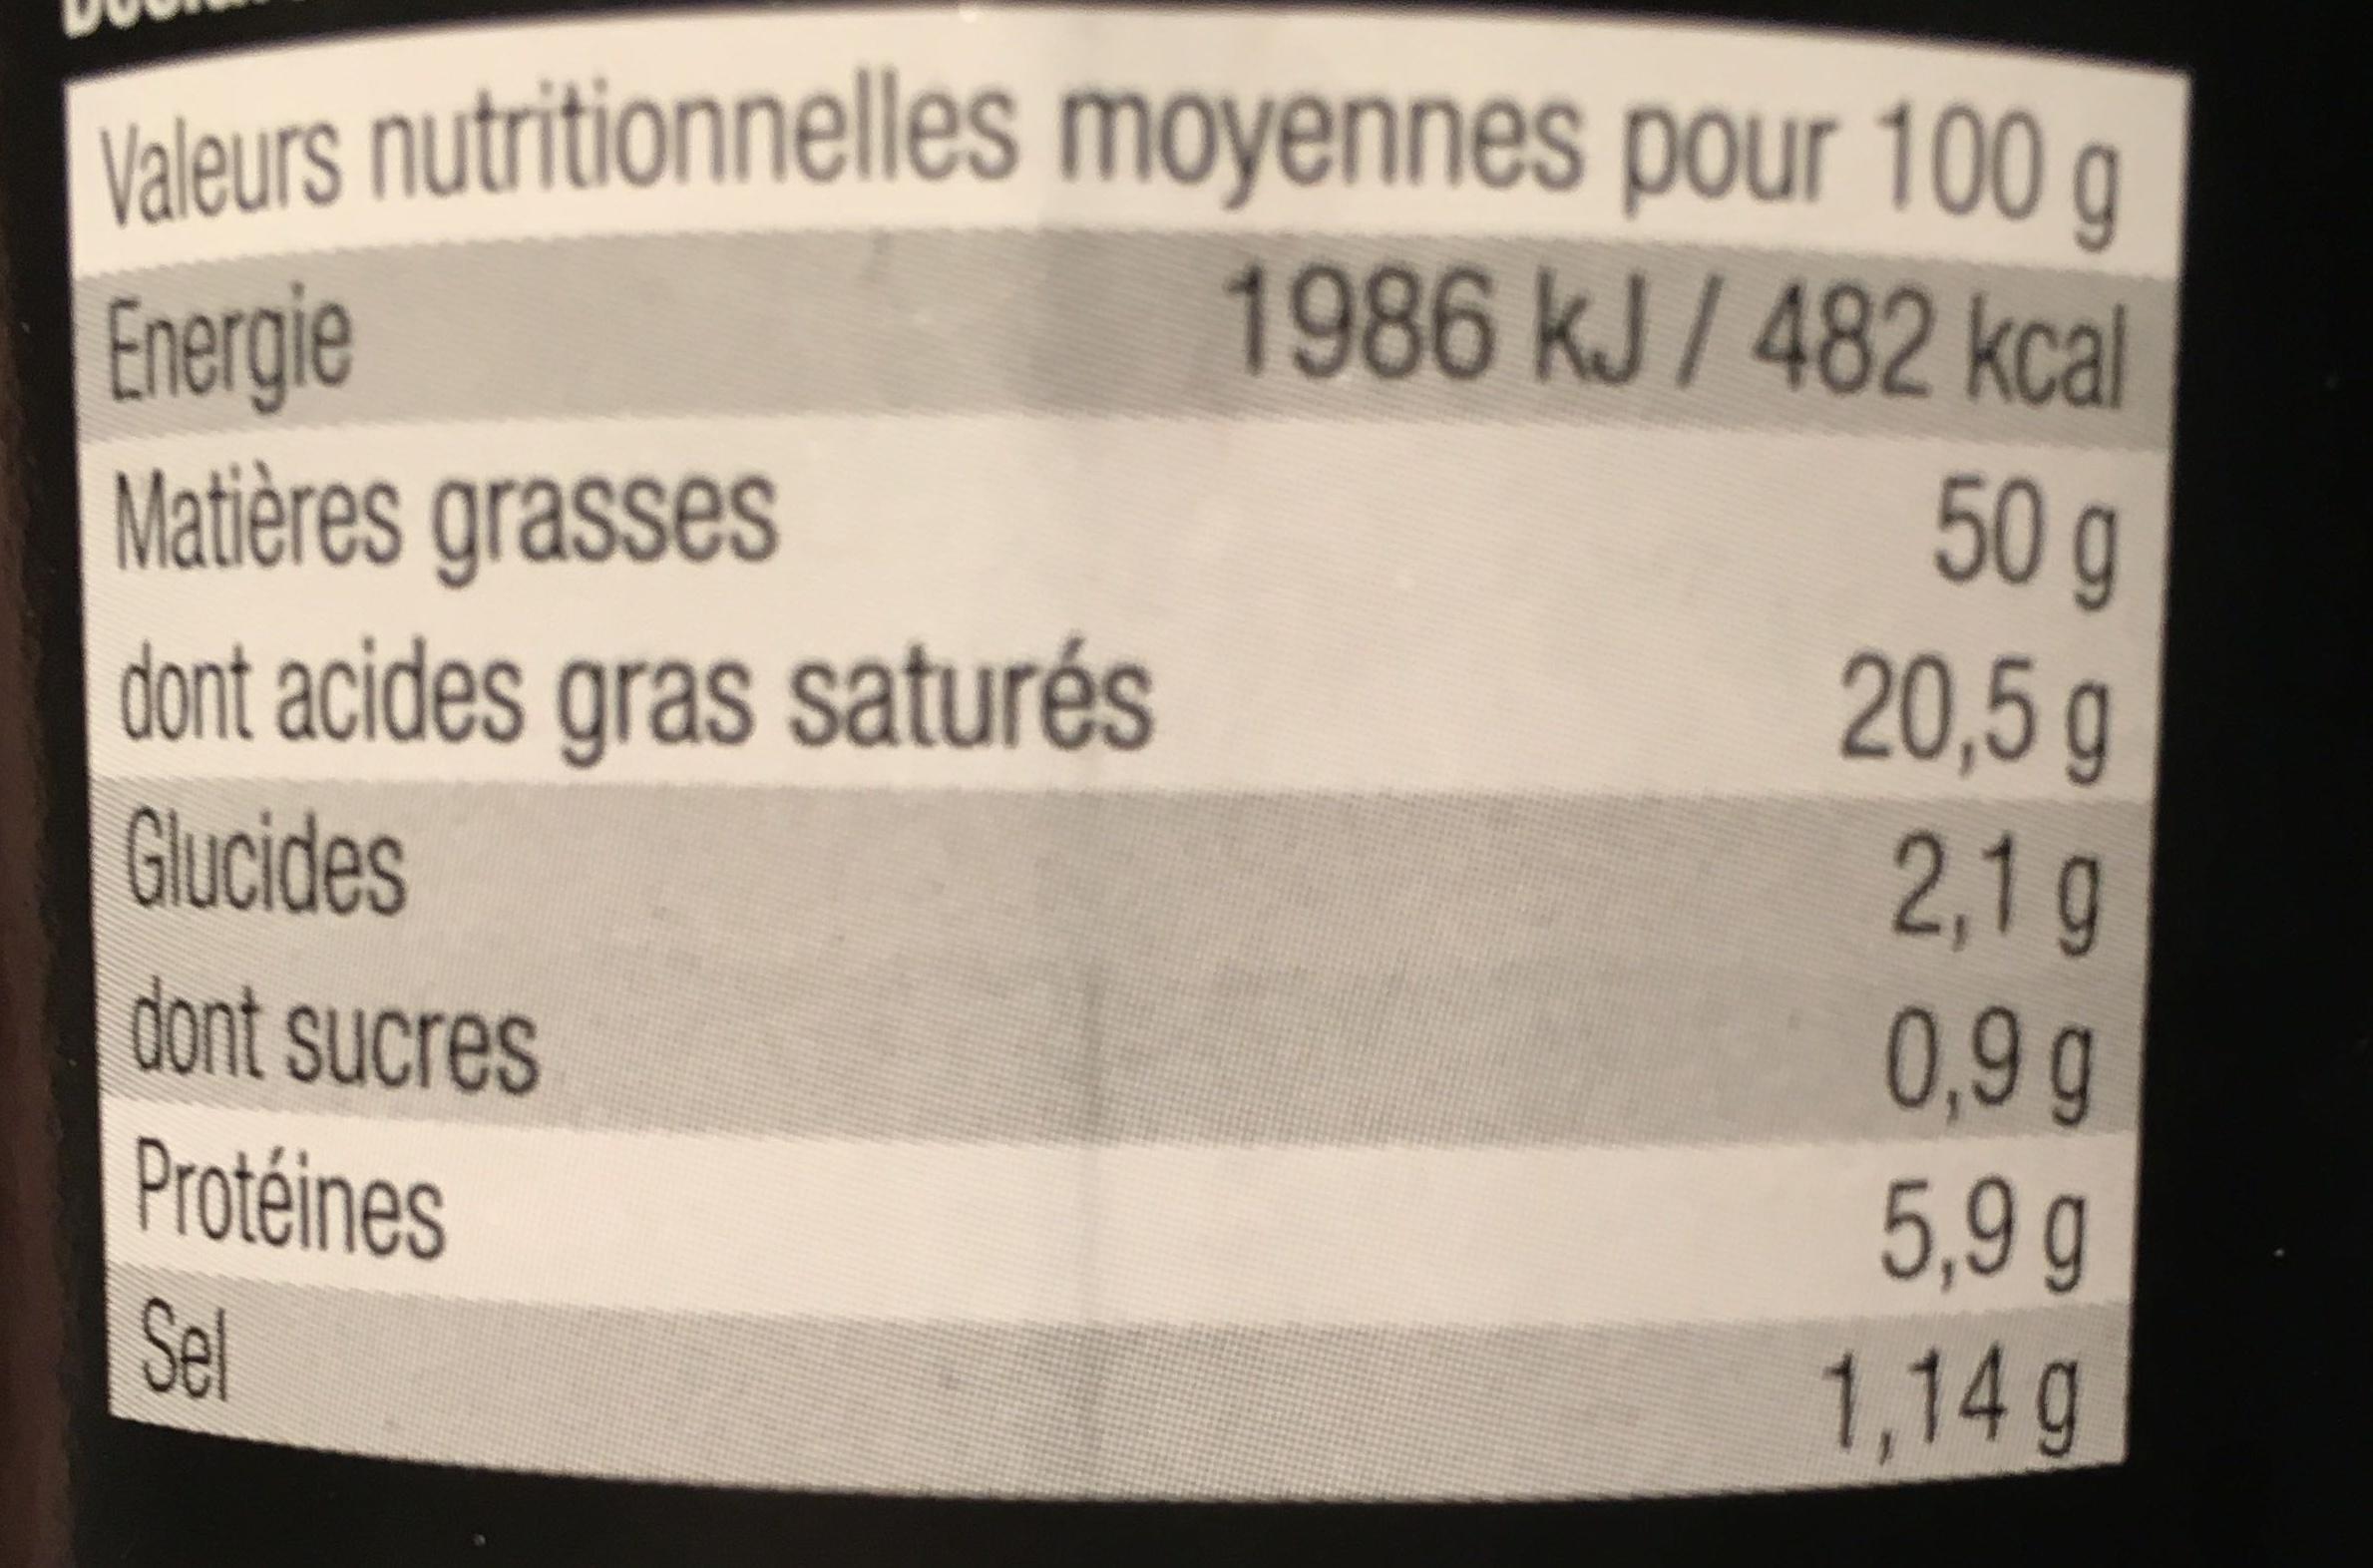 bloc de foie gras de canard succ s gourmand 200 g. Black Bedroom Furniture Sets. Home Design Ideas